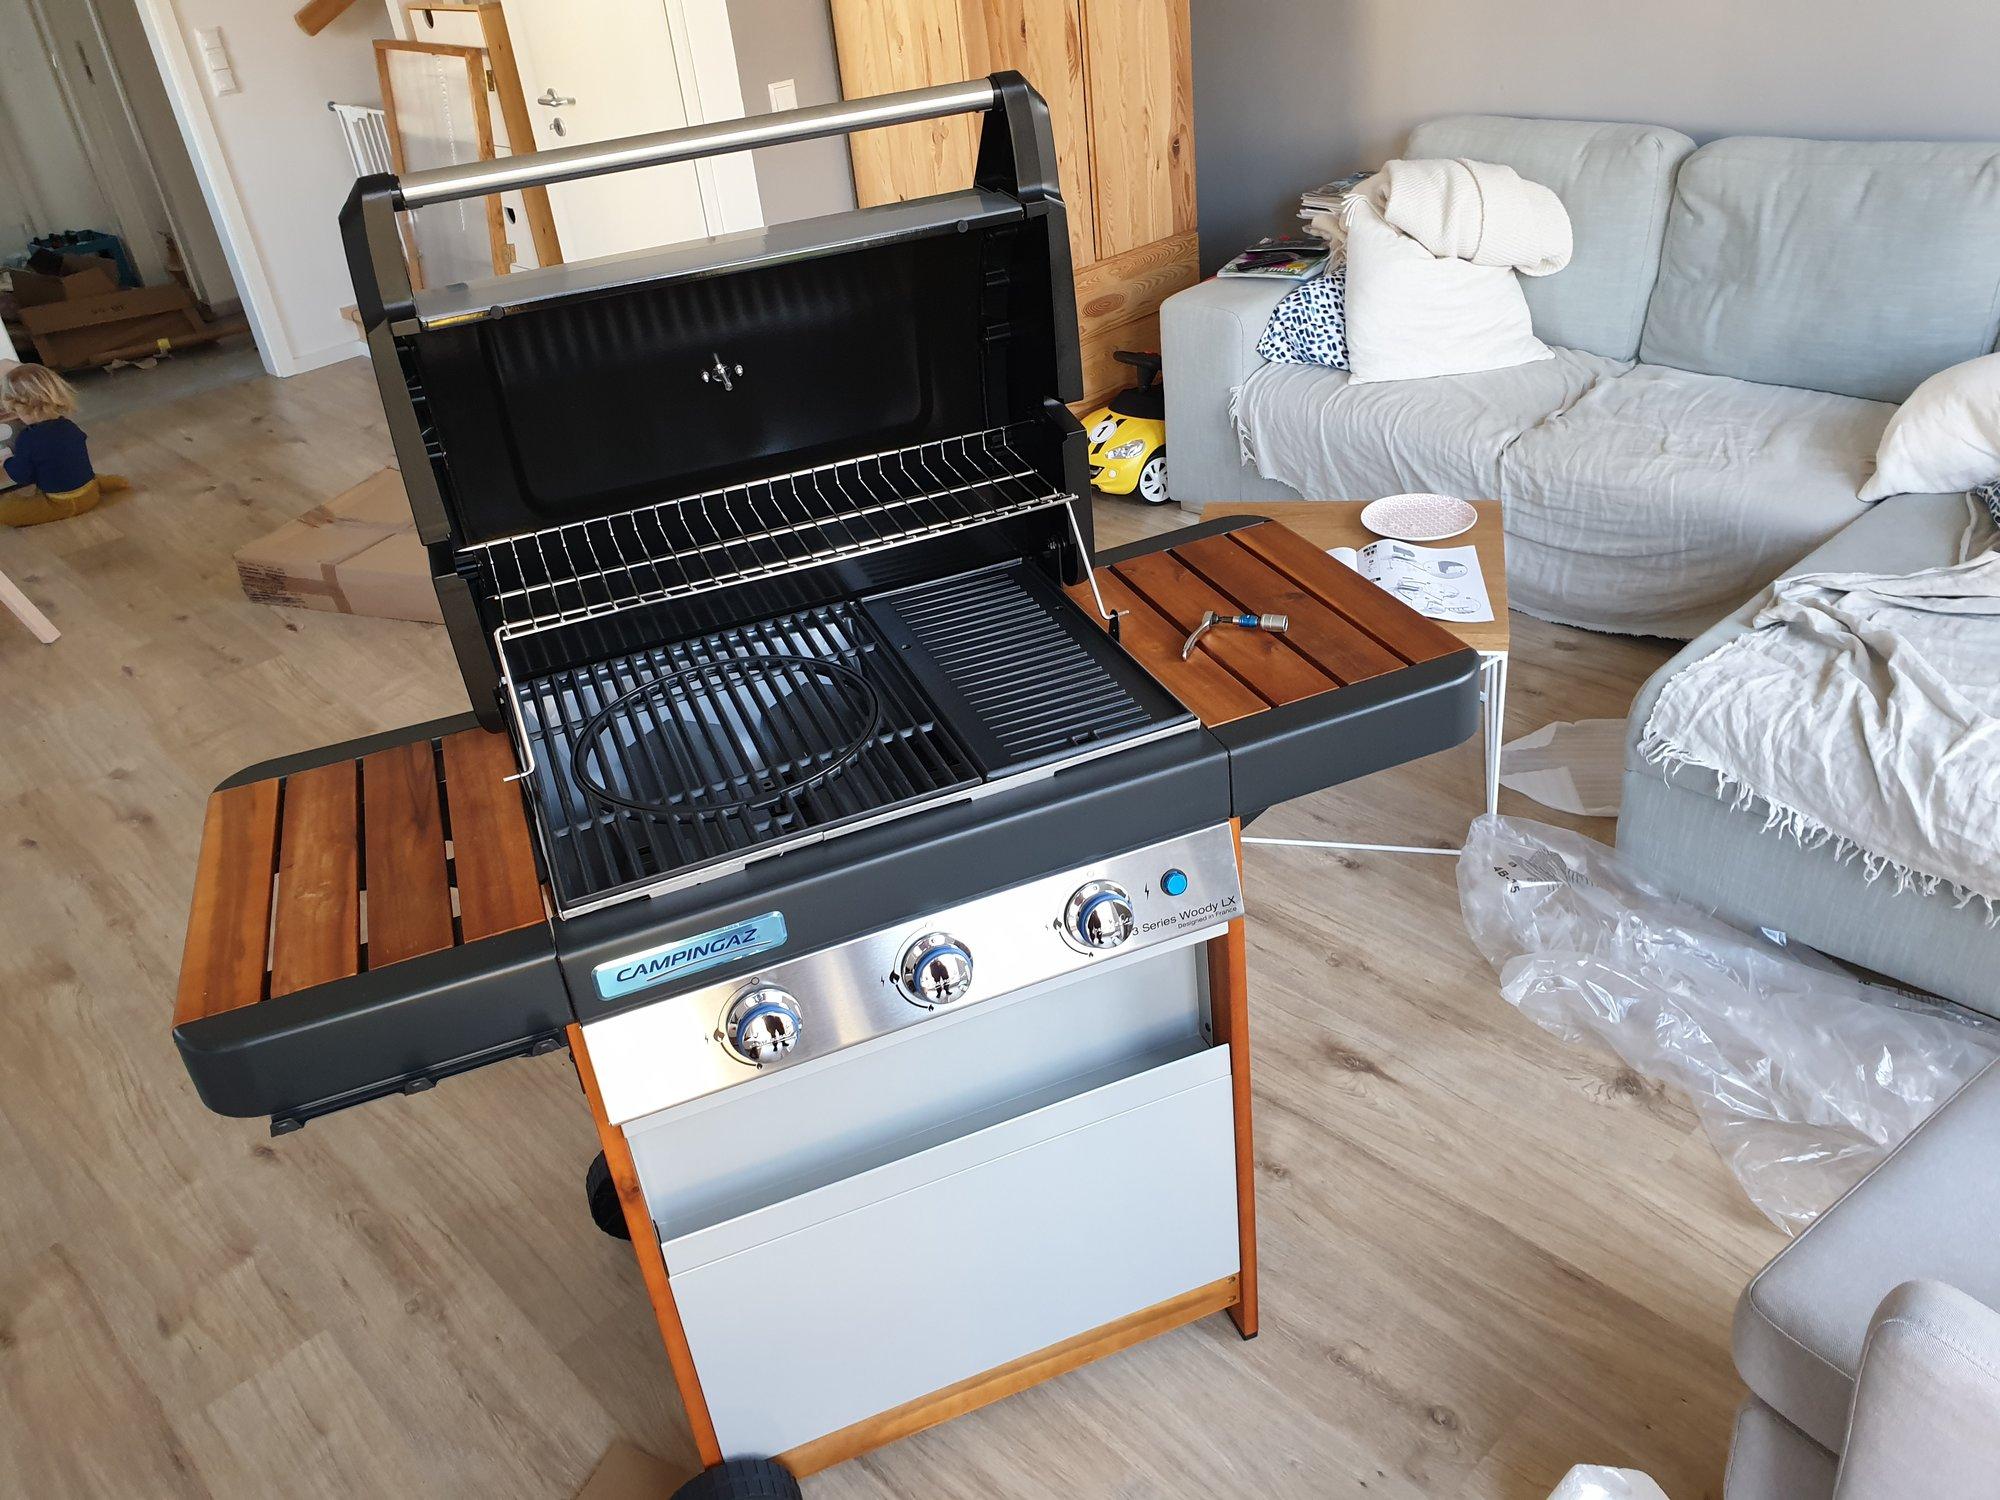 Campingaz 3 Series.Campingaz 3 Series Woody Lx Grillforum Und Bbq Www